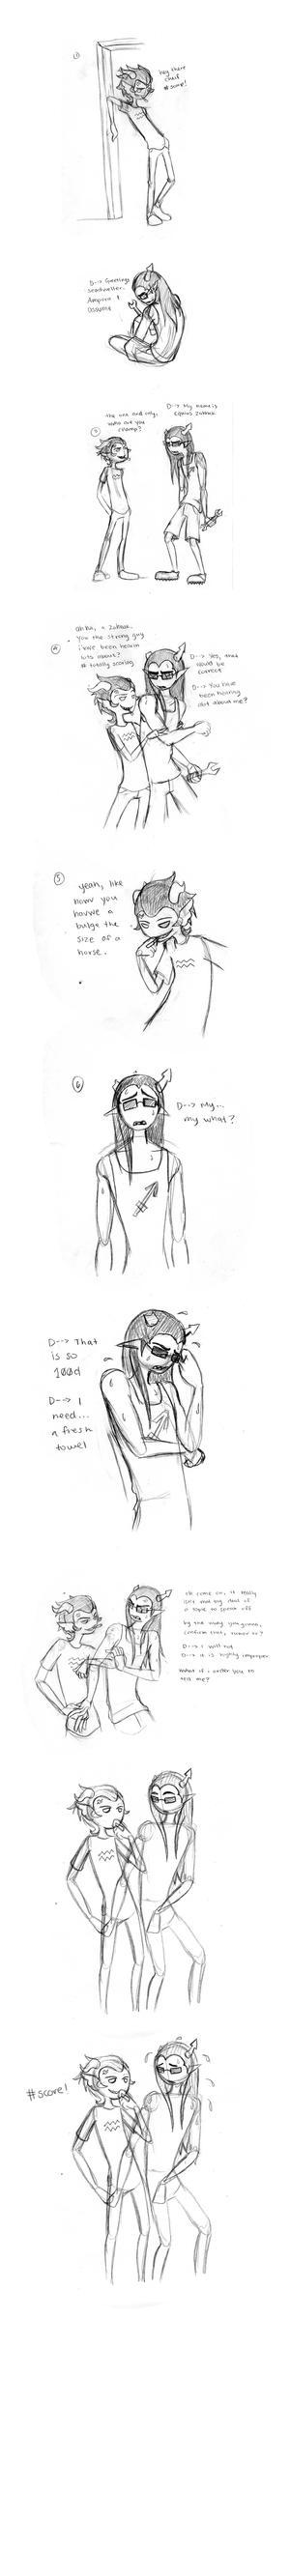 Comic-rough by Pluvicorn